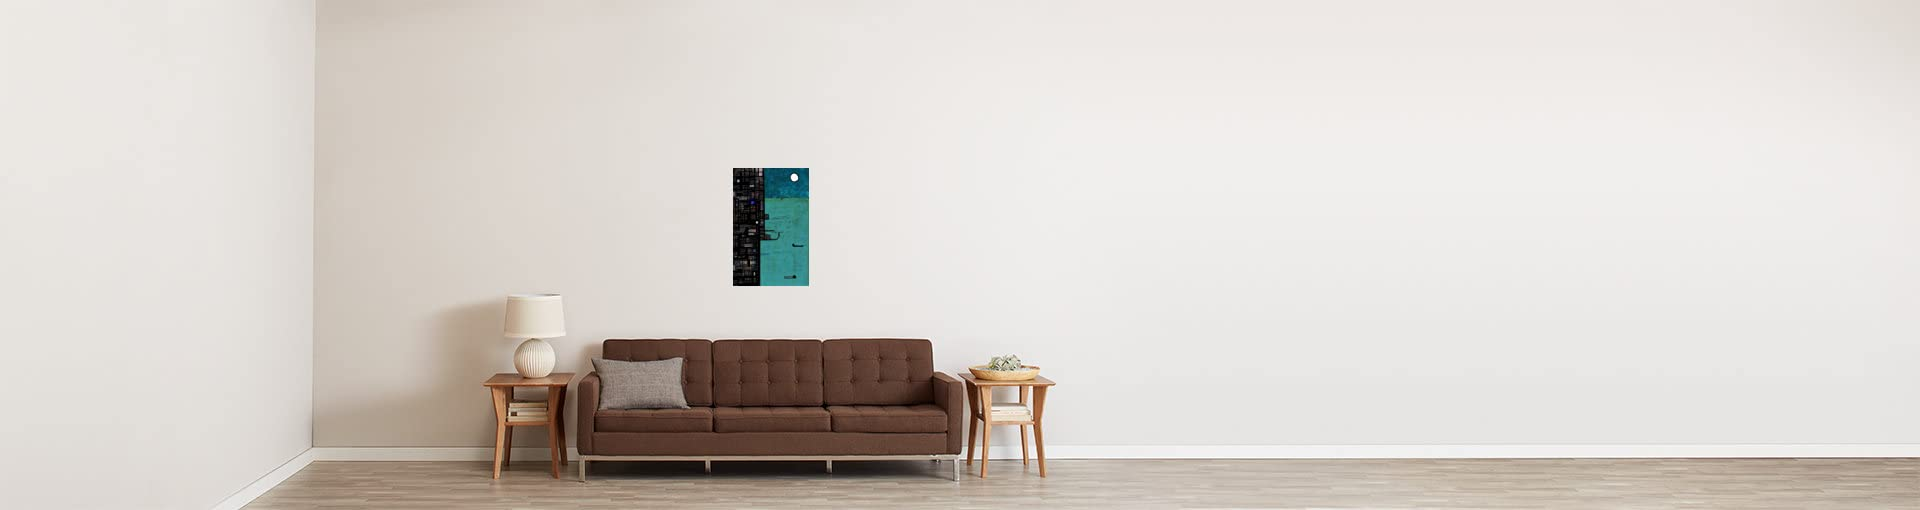 Amazon.com: Urbanizacion III: Andy Mercer: Fine Art